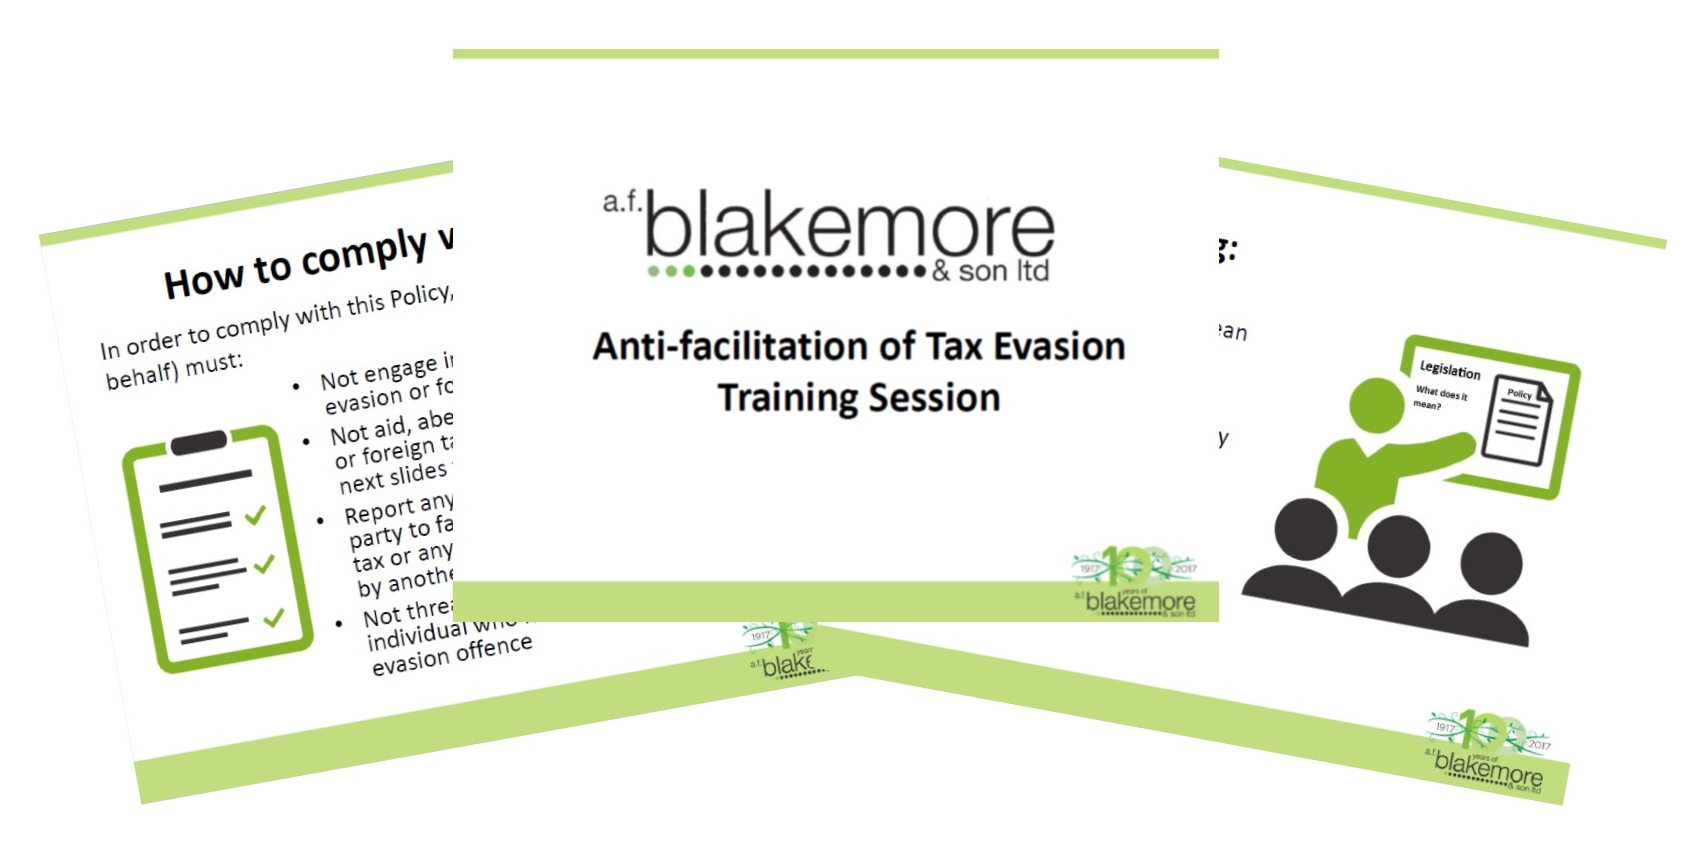 Anti-facilitation of Tax Evasion Policy